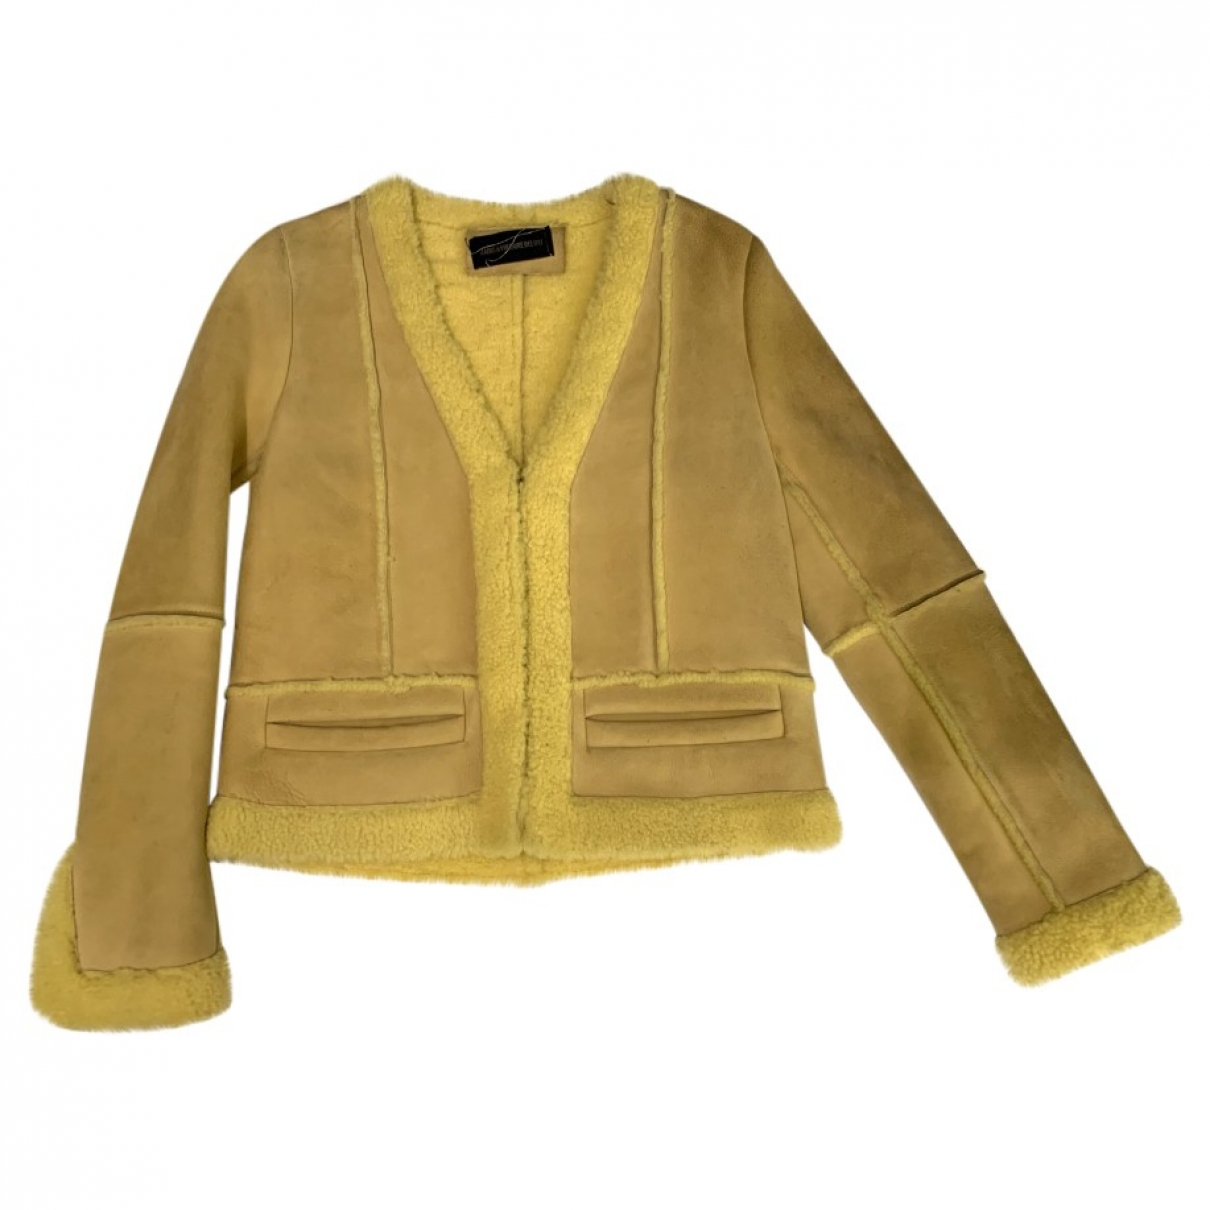 Zadig & Voltaire \N Yellow Suede jacket for Women S International